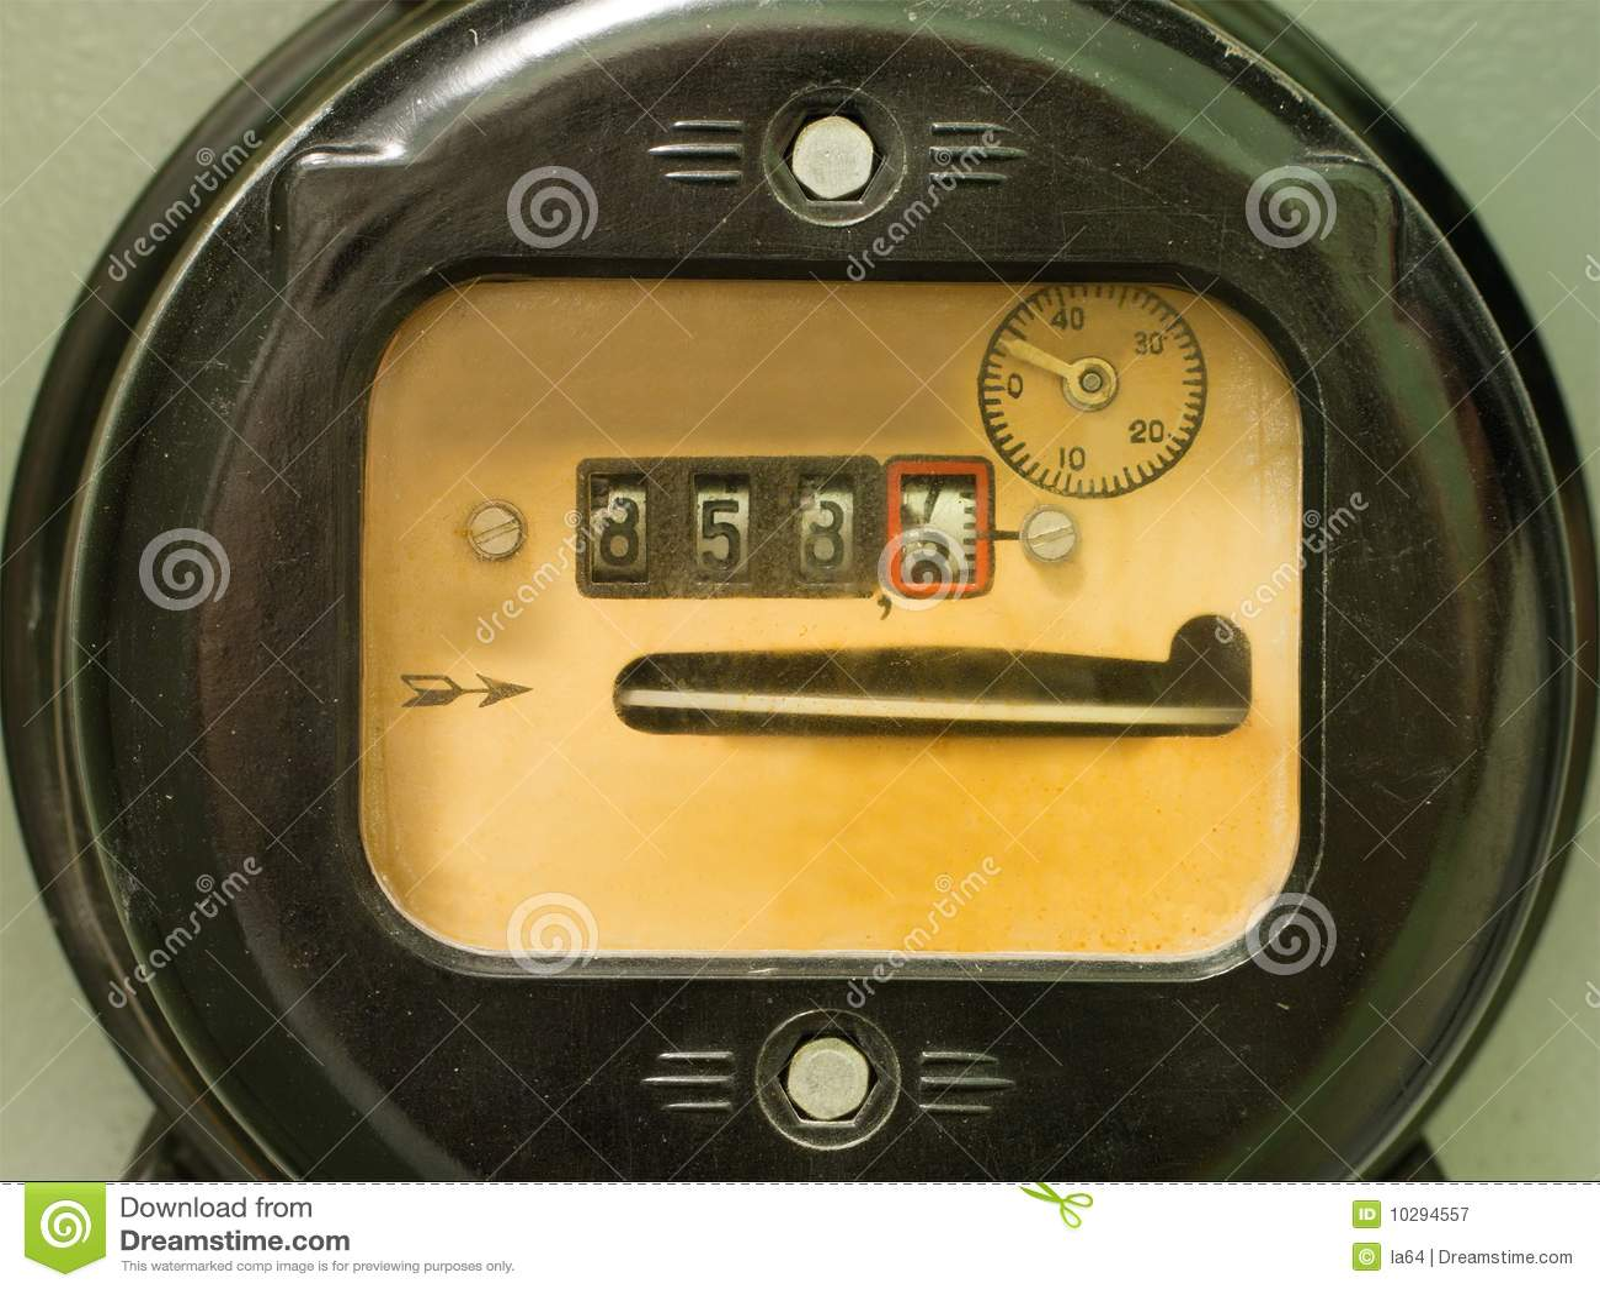 Power Meter Cartoon : Electricity supply meter royalty free stock photo